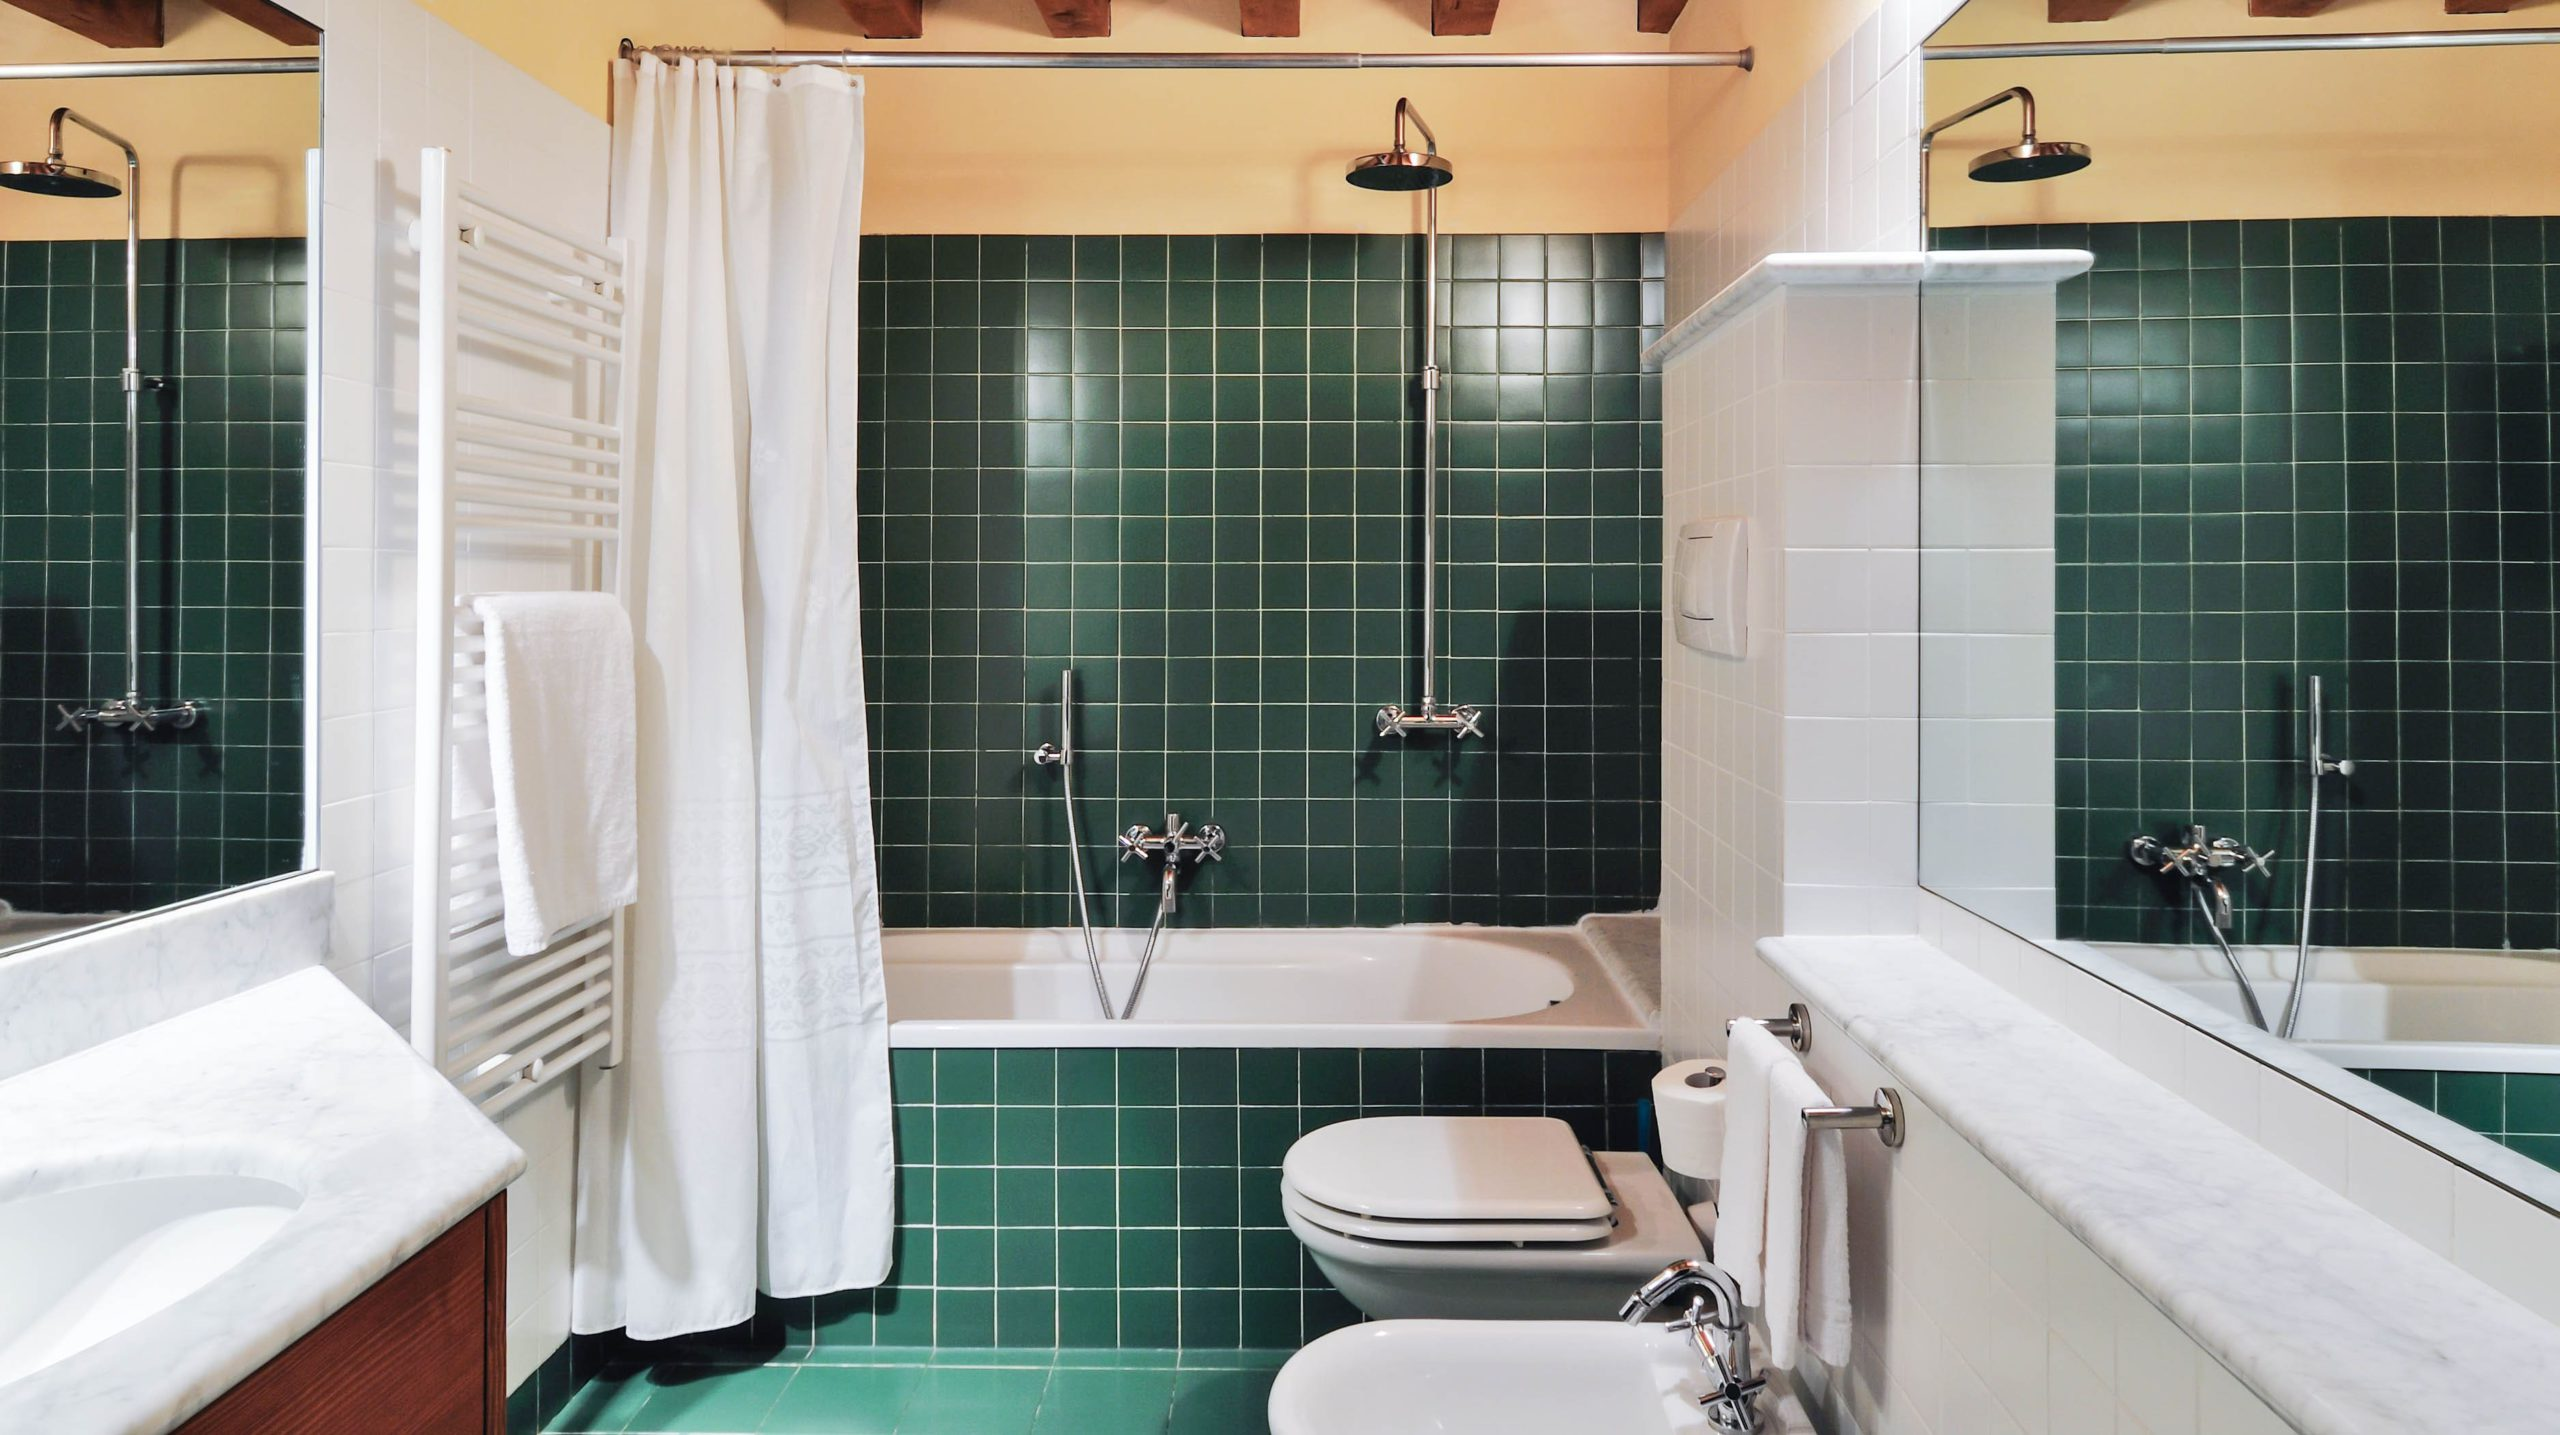 Lilium badkamer